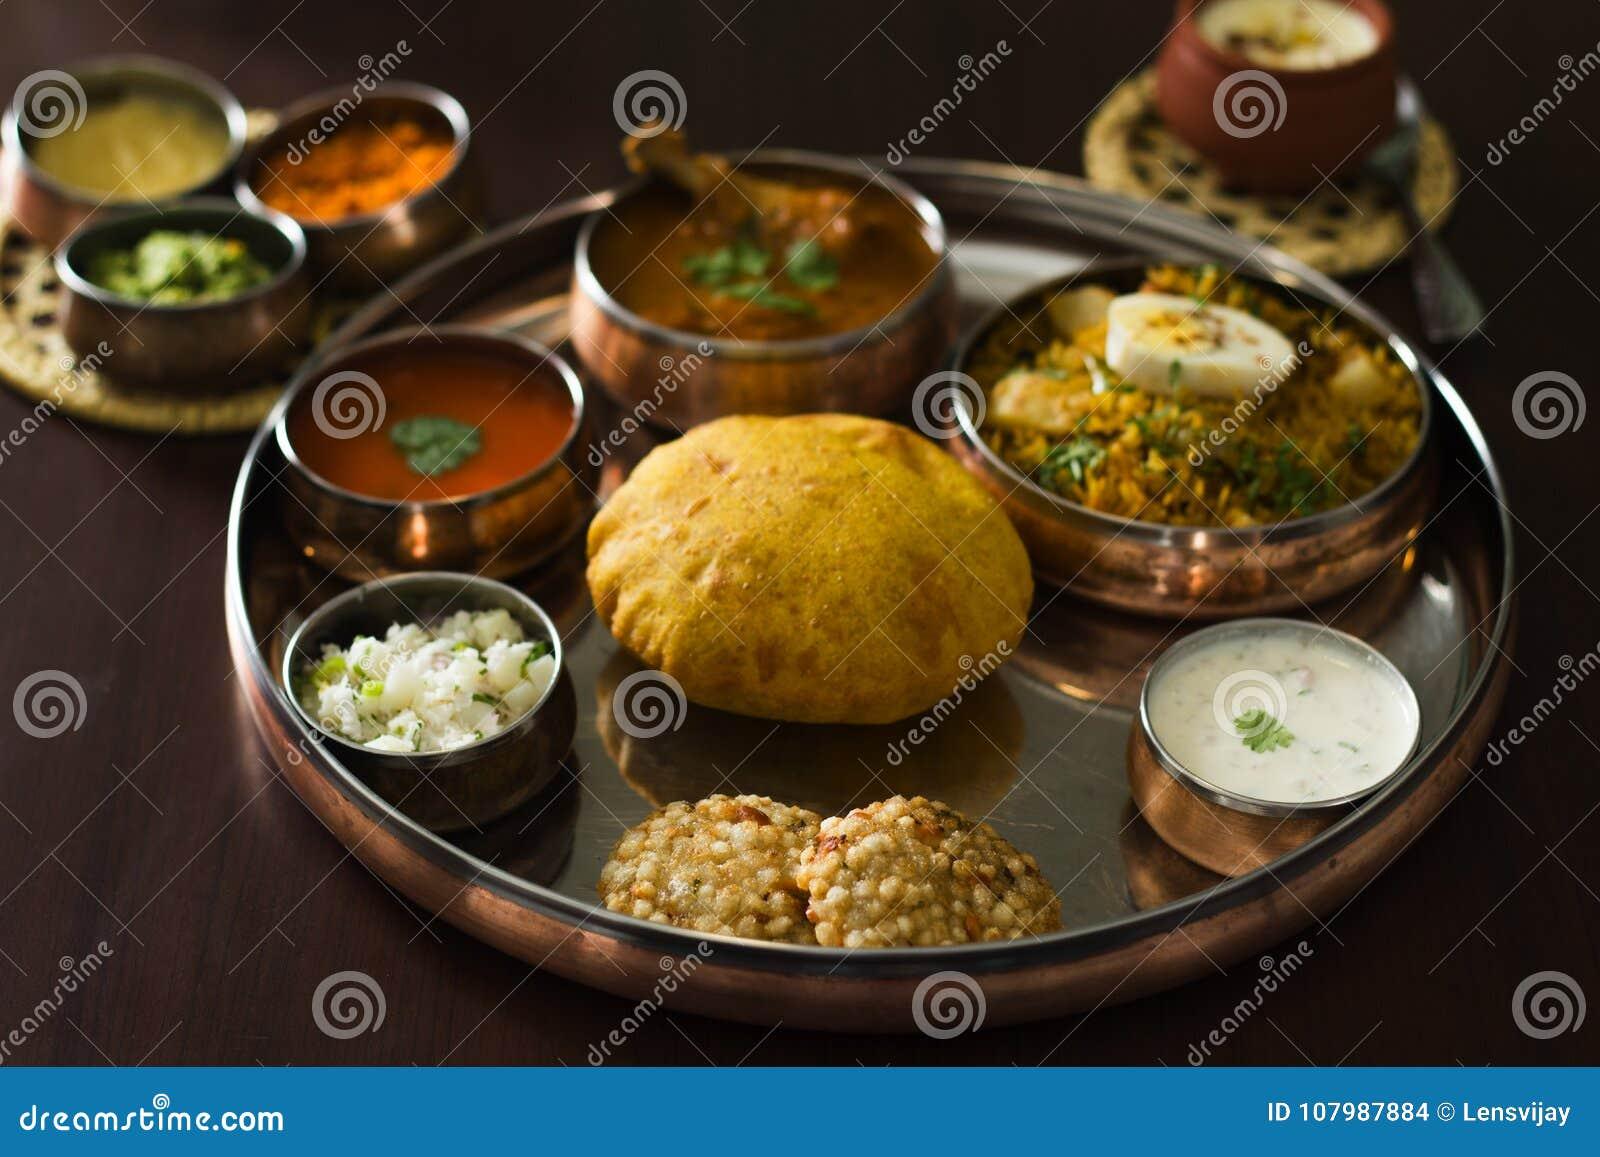 Indian food presentation